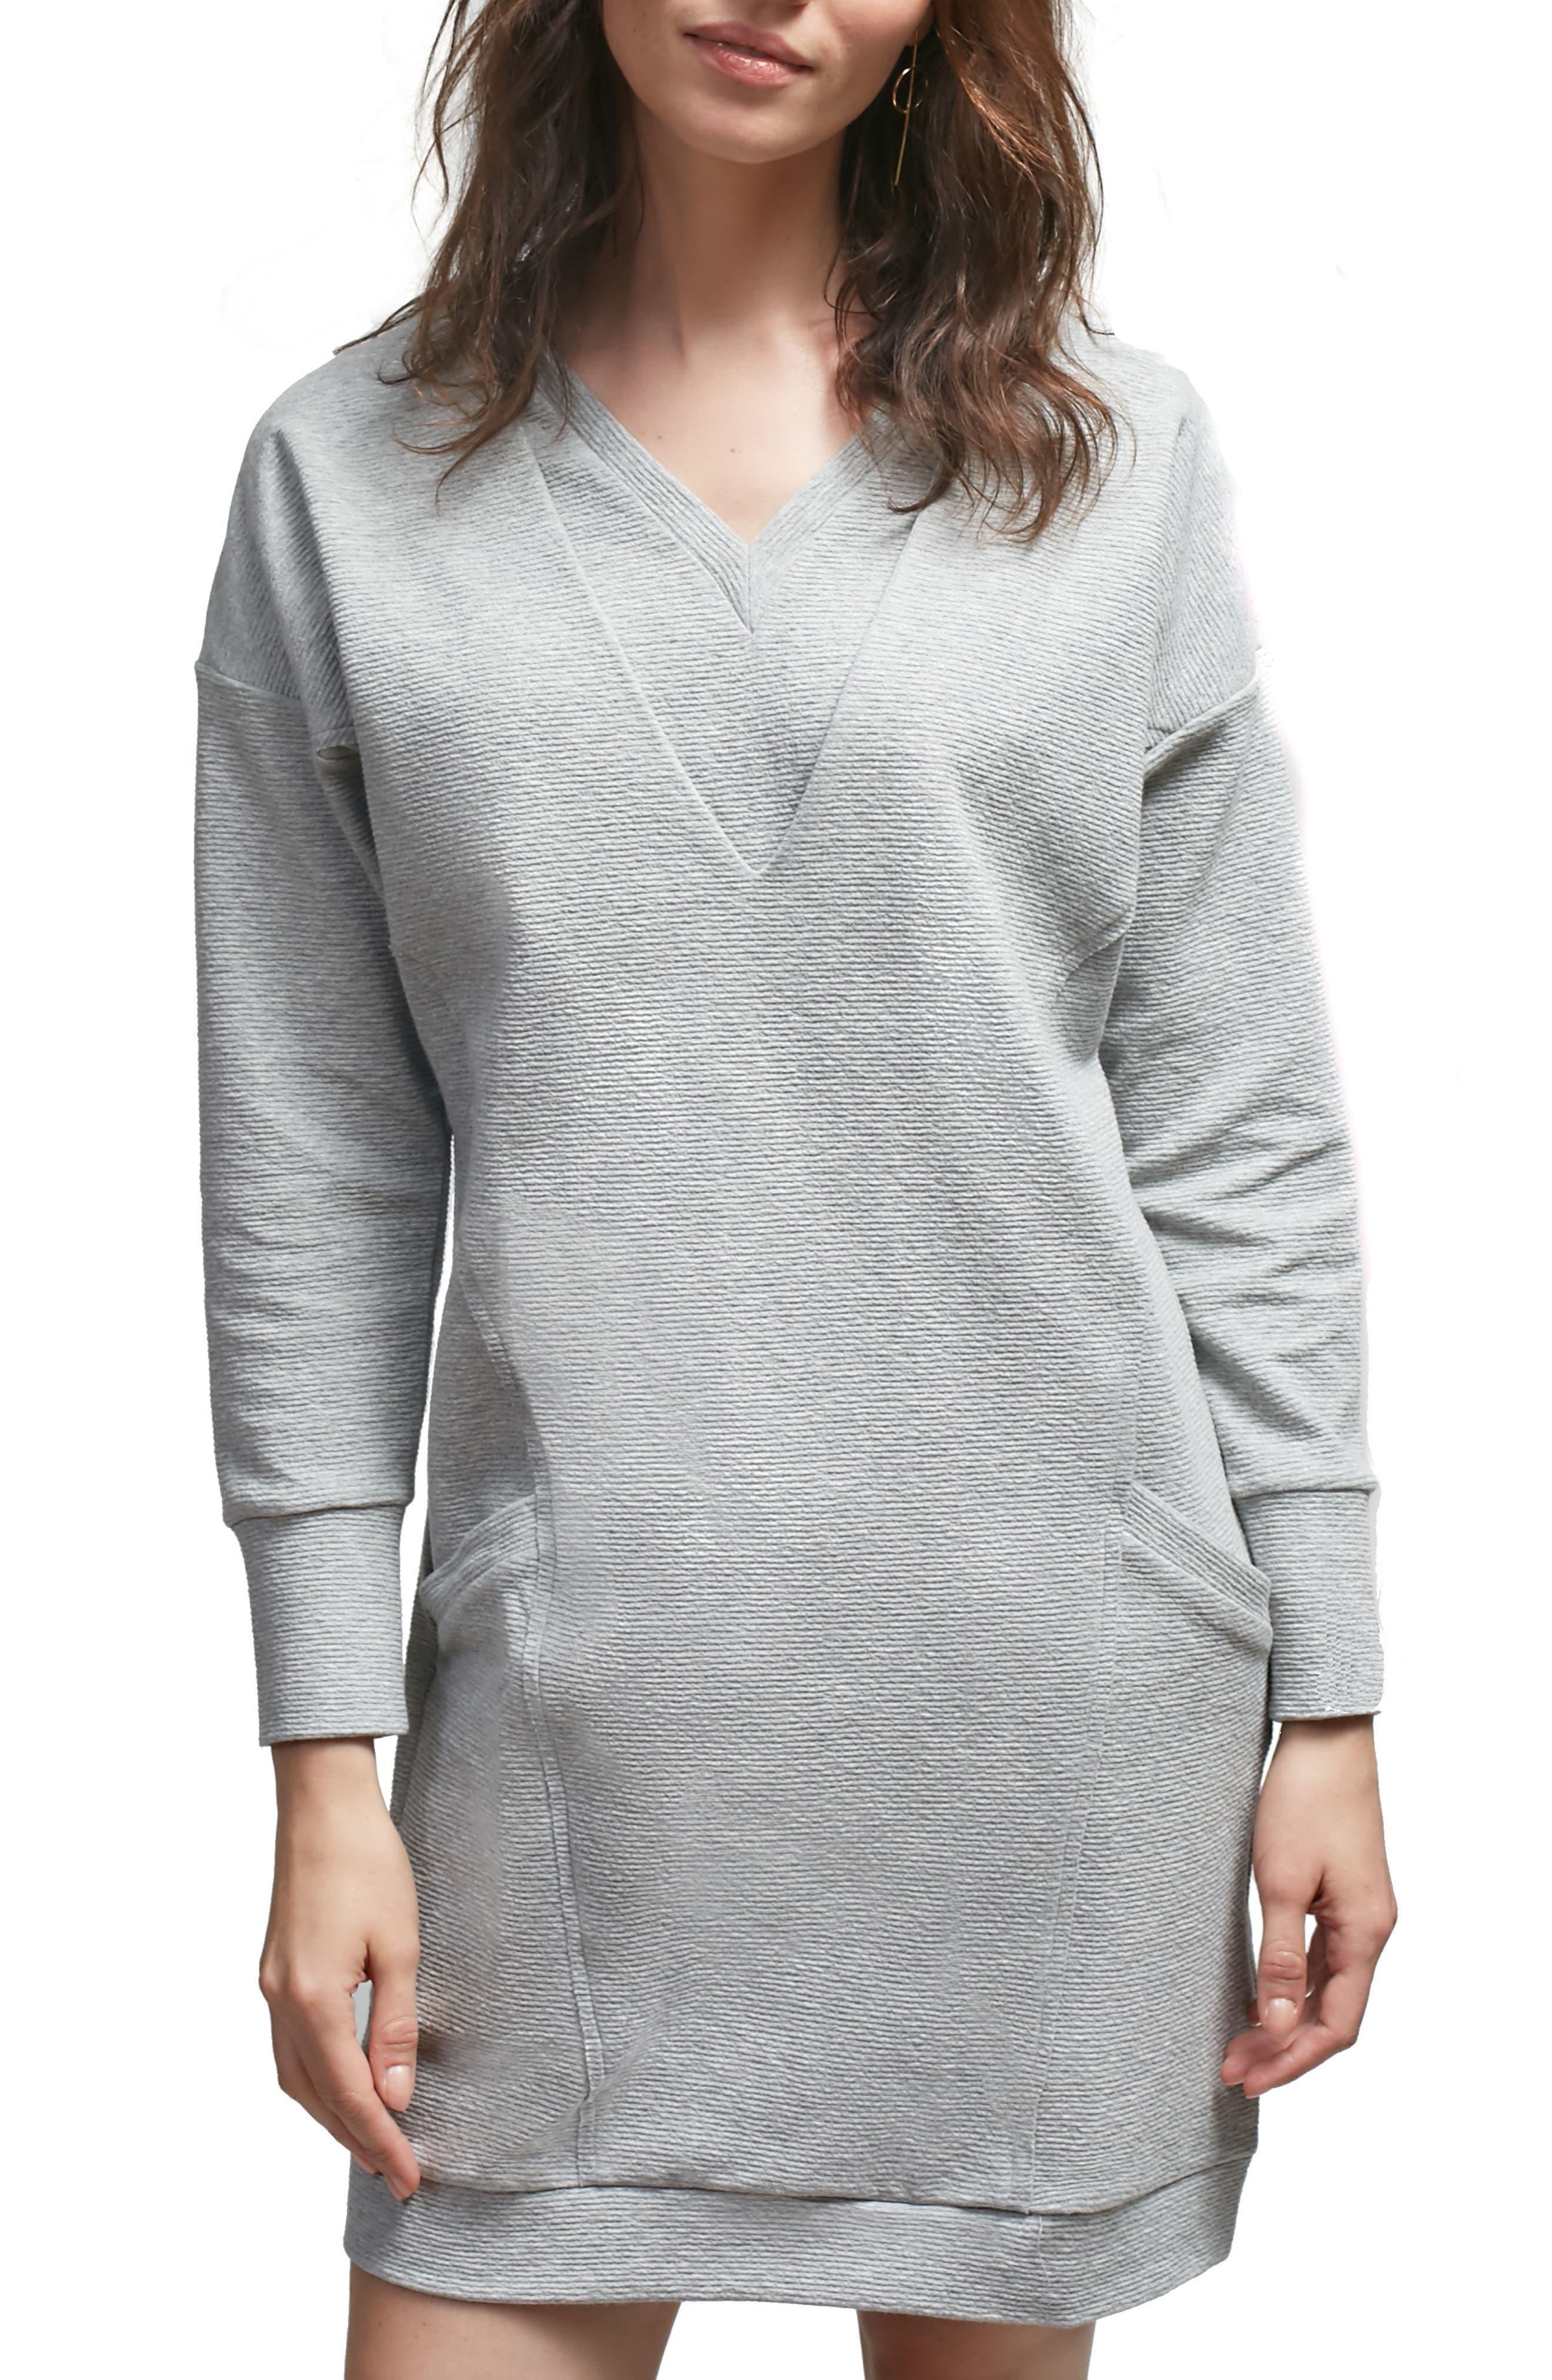 Allette Margot Nursing Sweater Dress